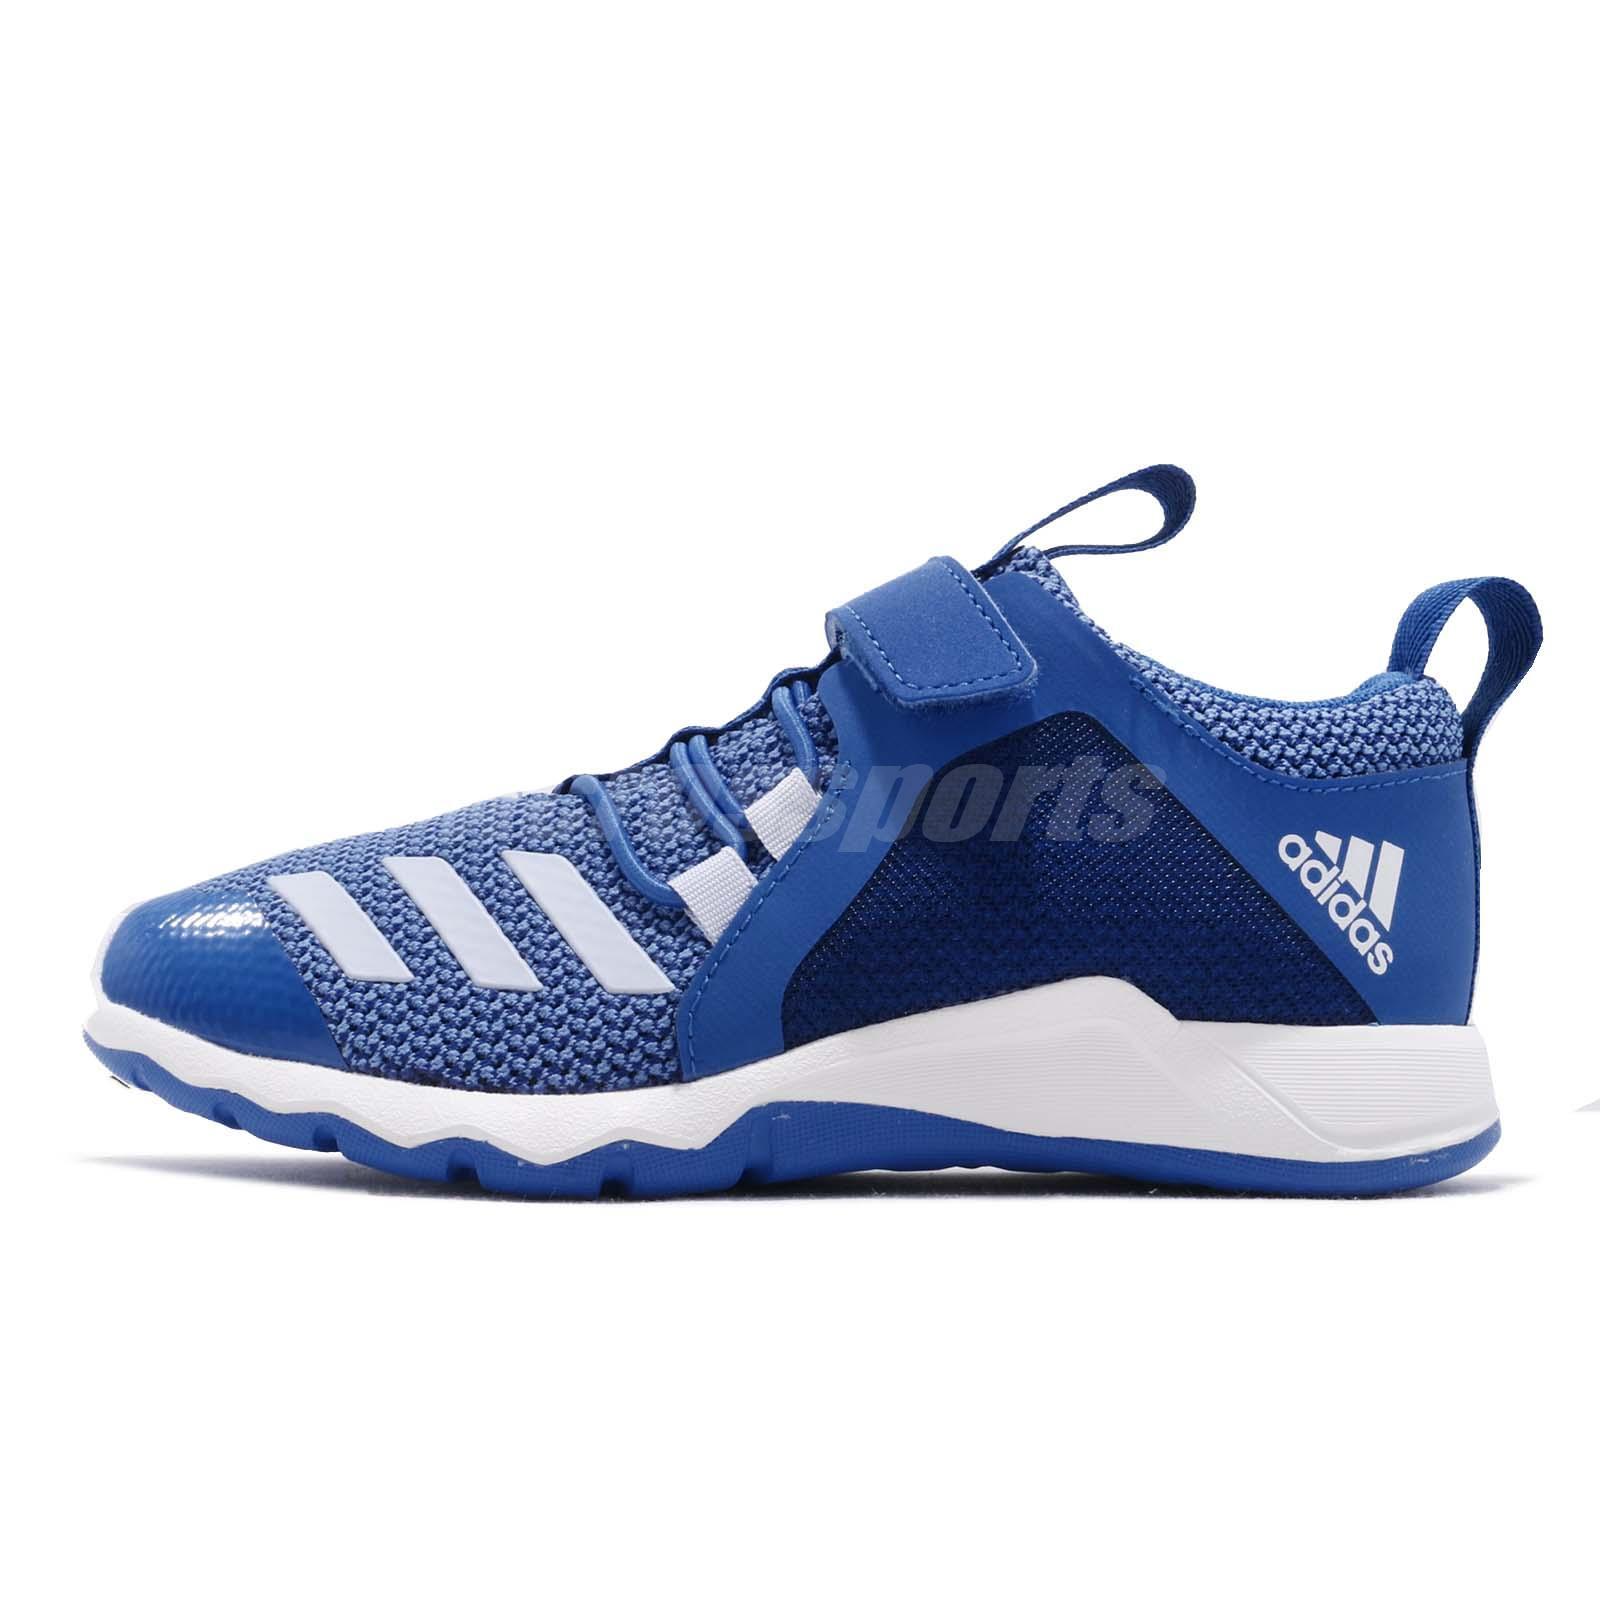 dc89e5f568b adidas RapidaFlex Aero Blue Collegiate Royal White Kid Preschool Shoes  D97604